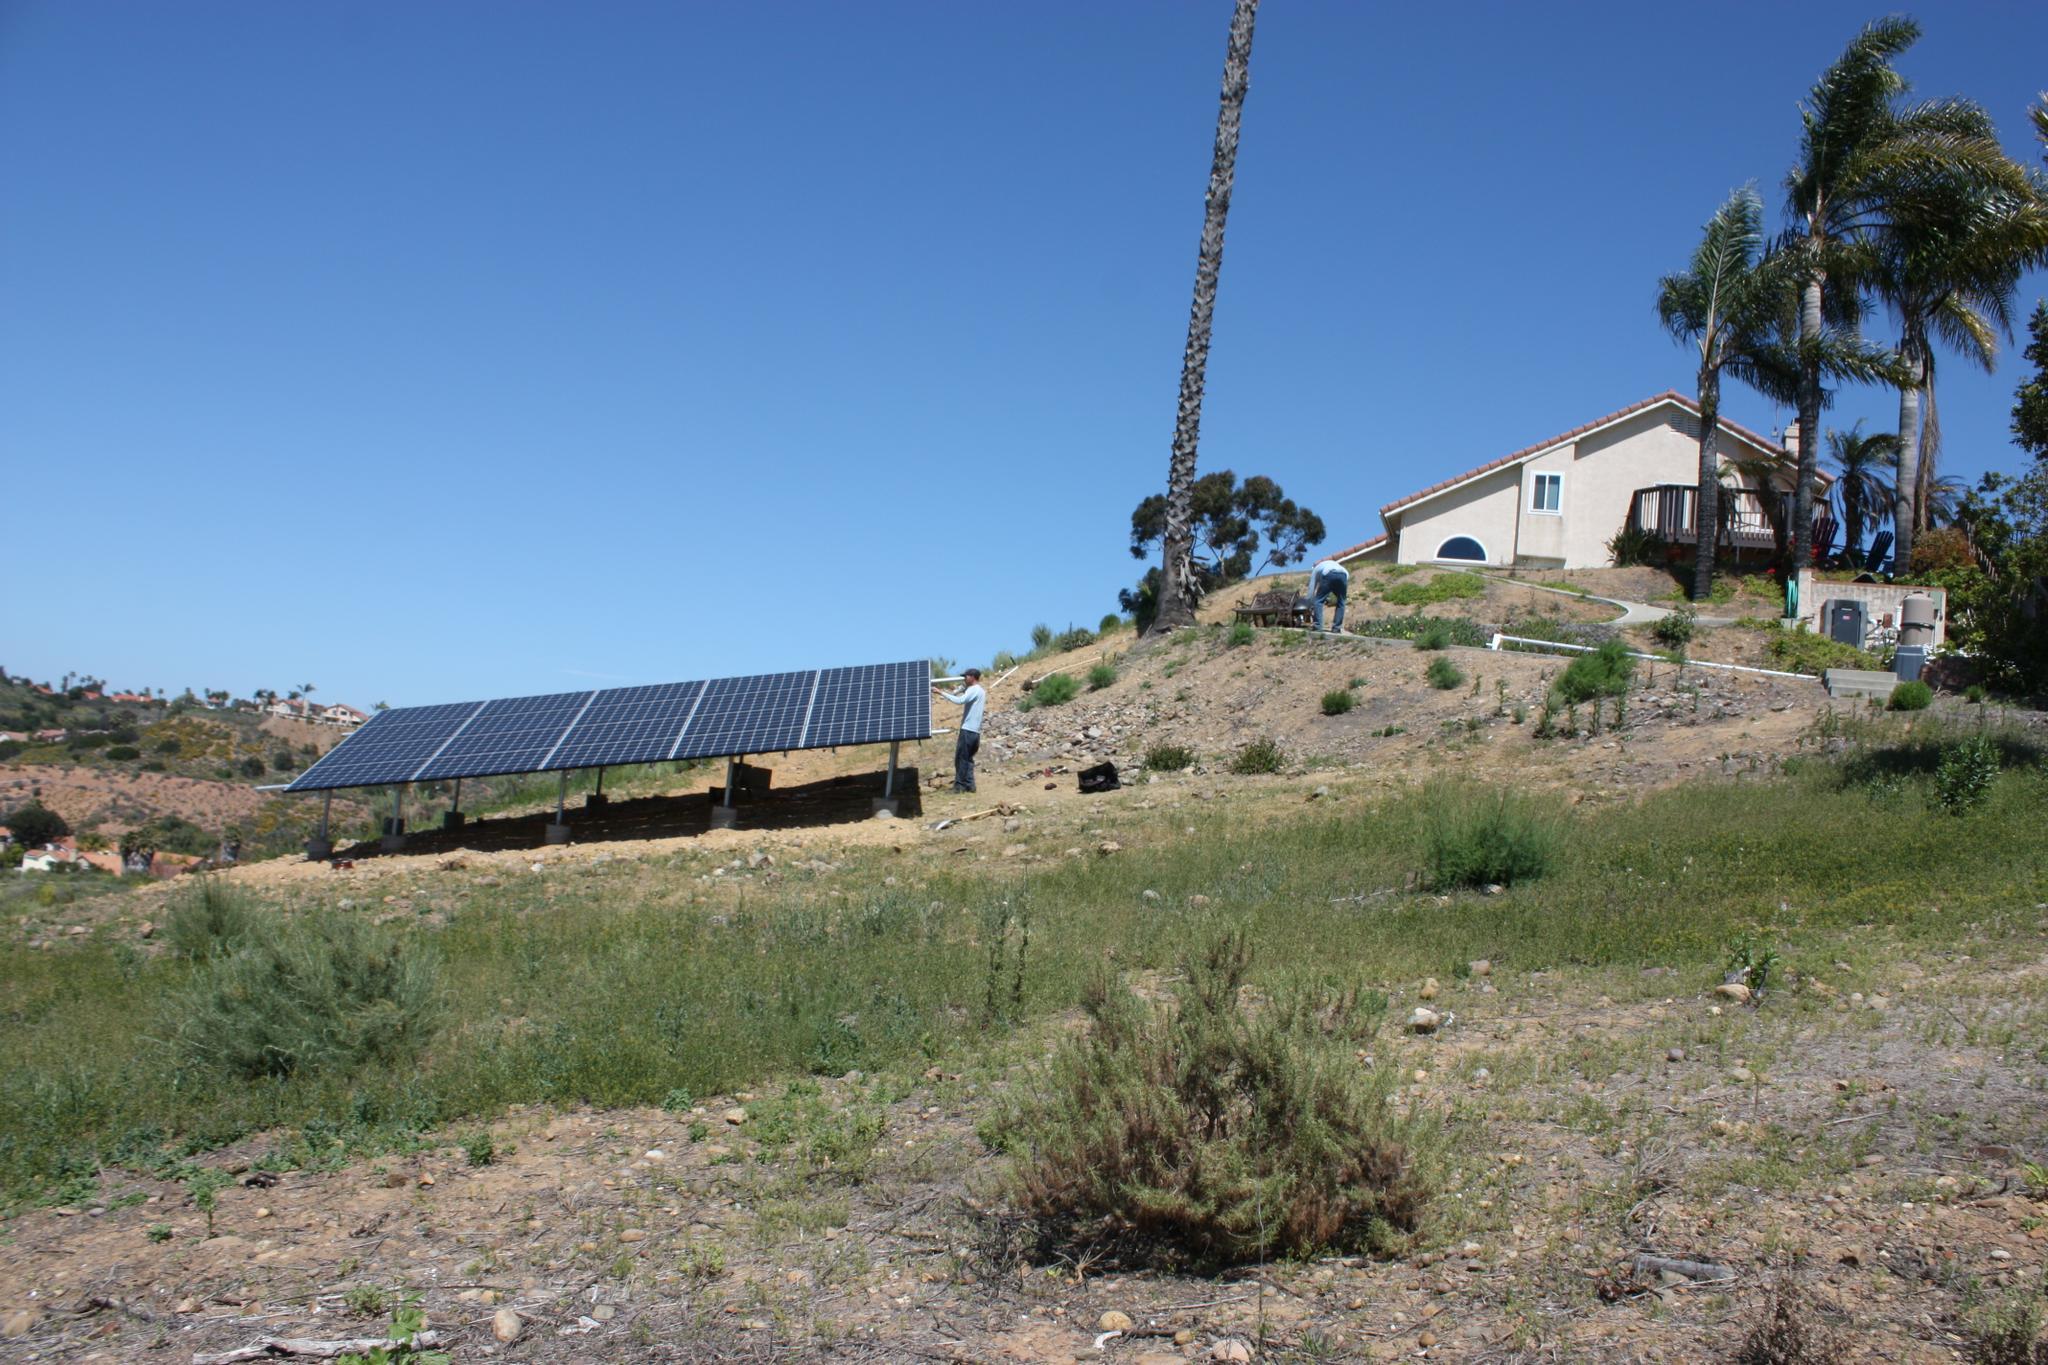 Fota Solar Energysage